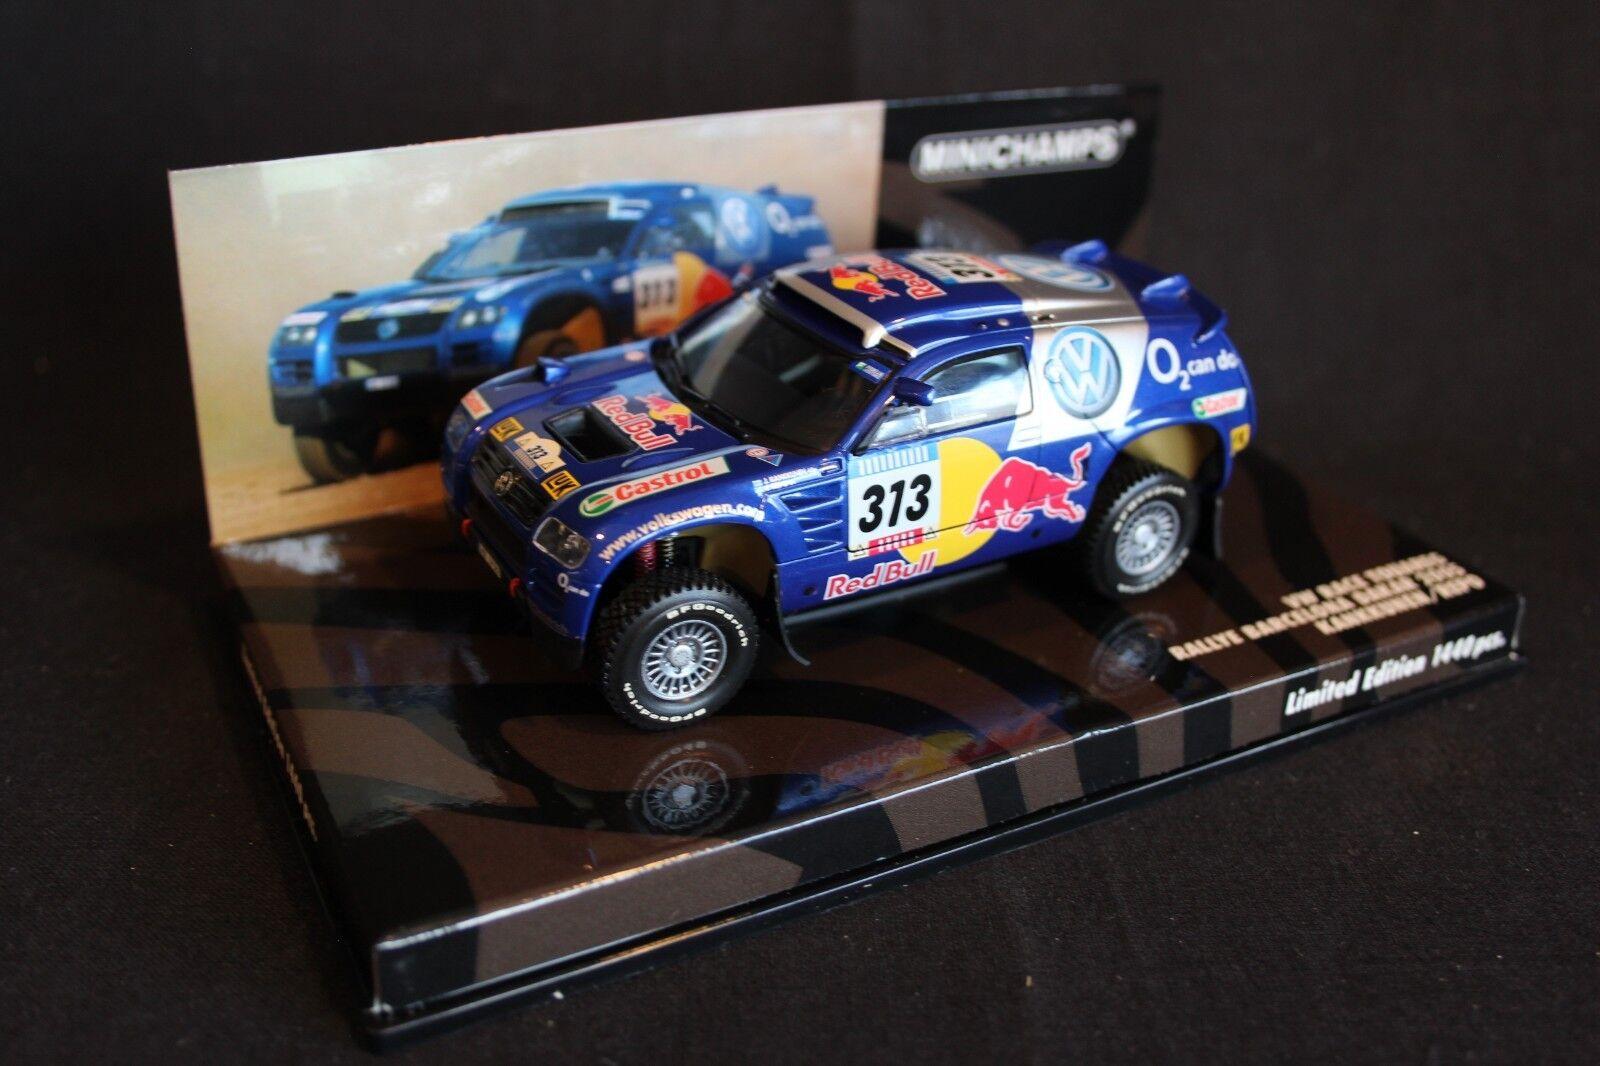 comodamente Minichamps VW Race Race Race Touareg 2005 1 43  313 Kankkunen   Repo Dakar Rtuttiy  i nuovi stili più caldi